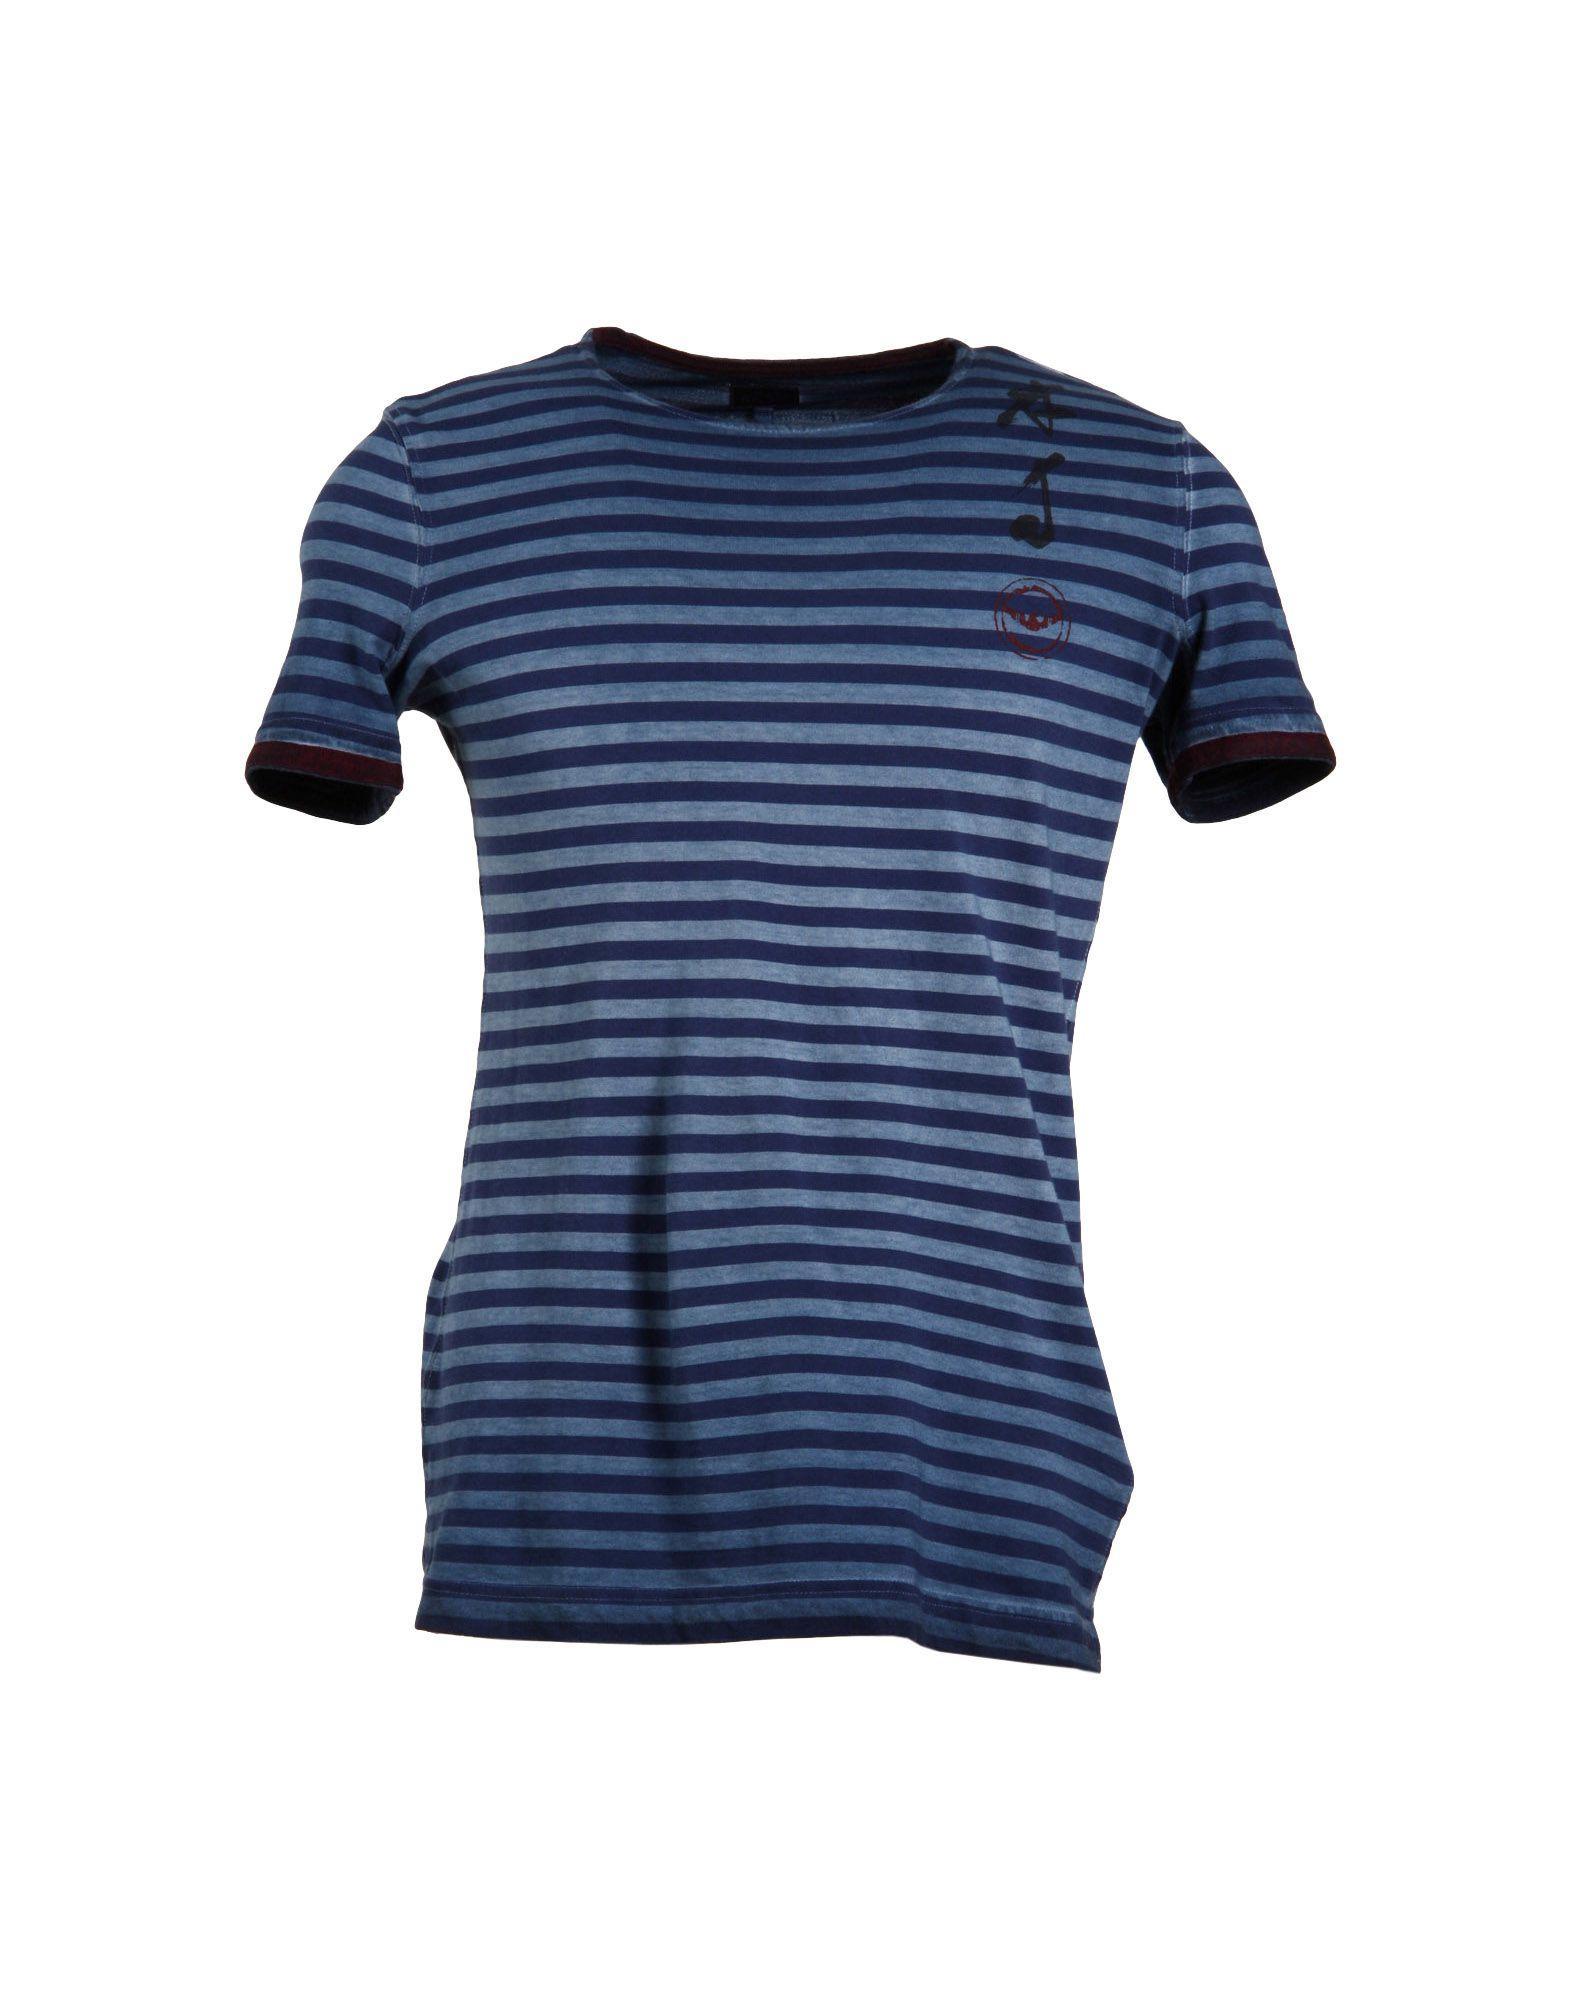 armani jeans short sleeve t shirt in blue for men lyst. Black Bedroom Furniture Sets. Home Design Ideas